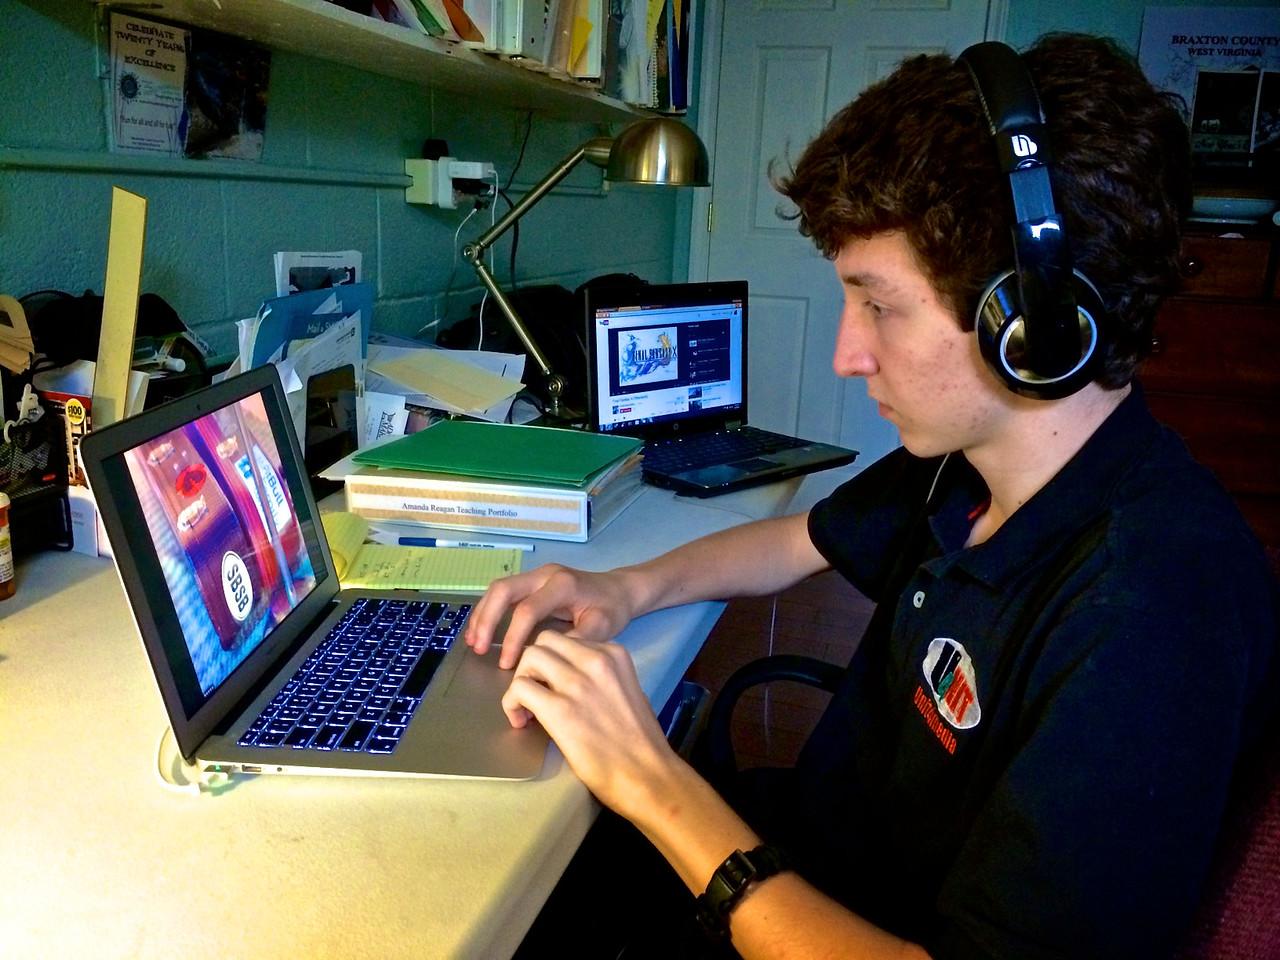 Unit4media digital video editing